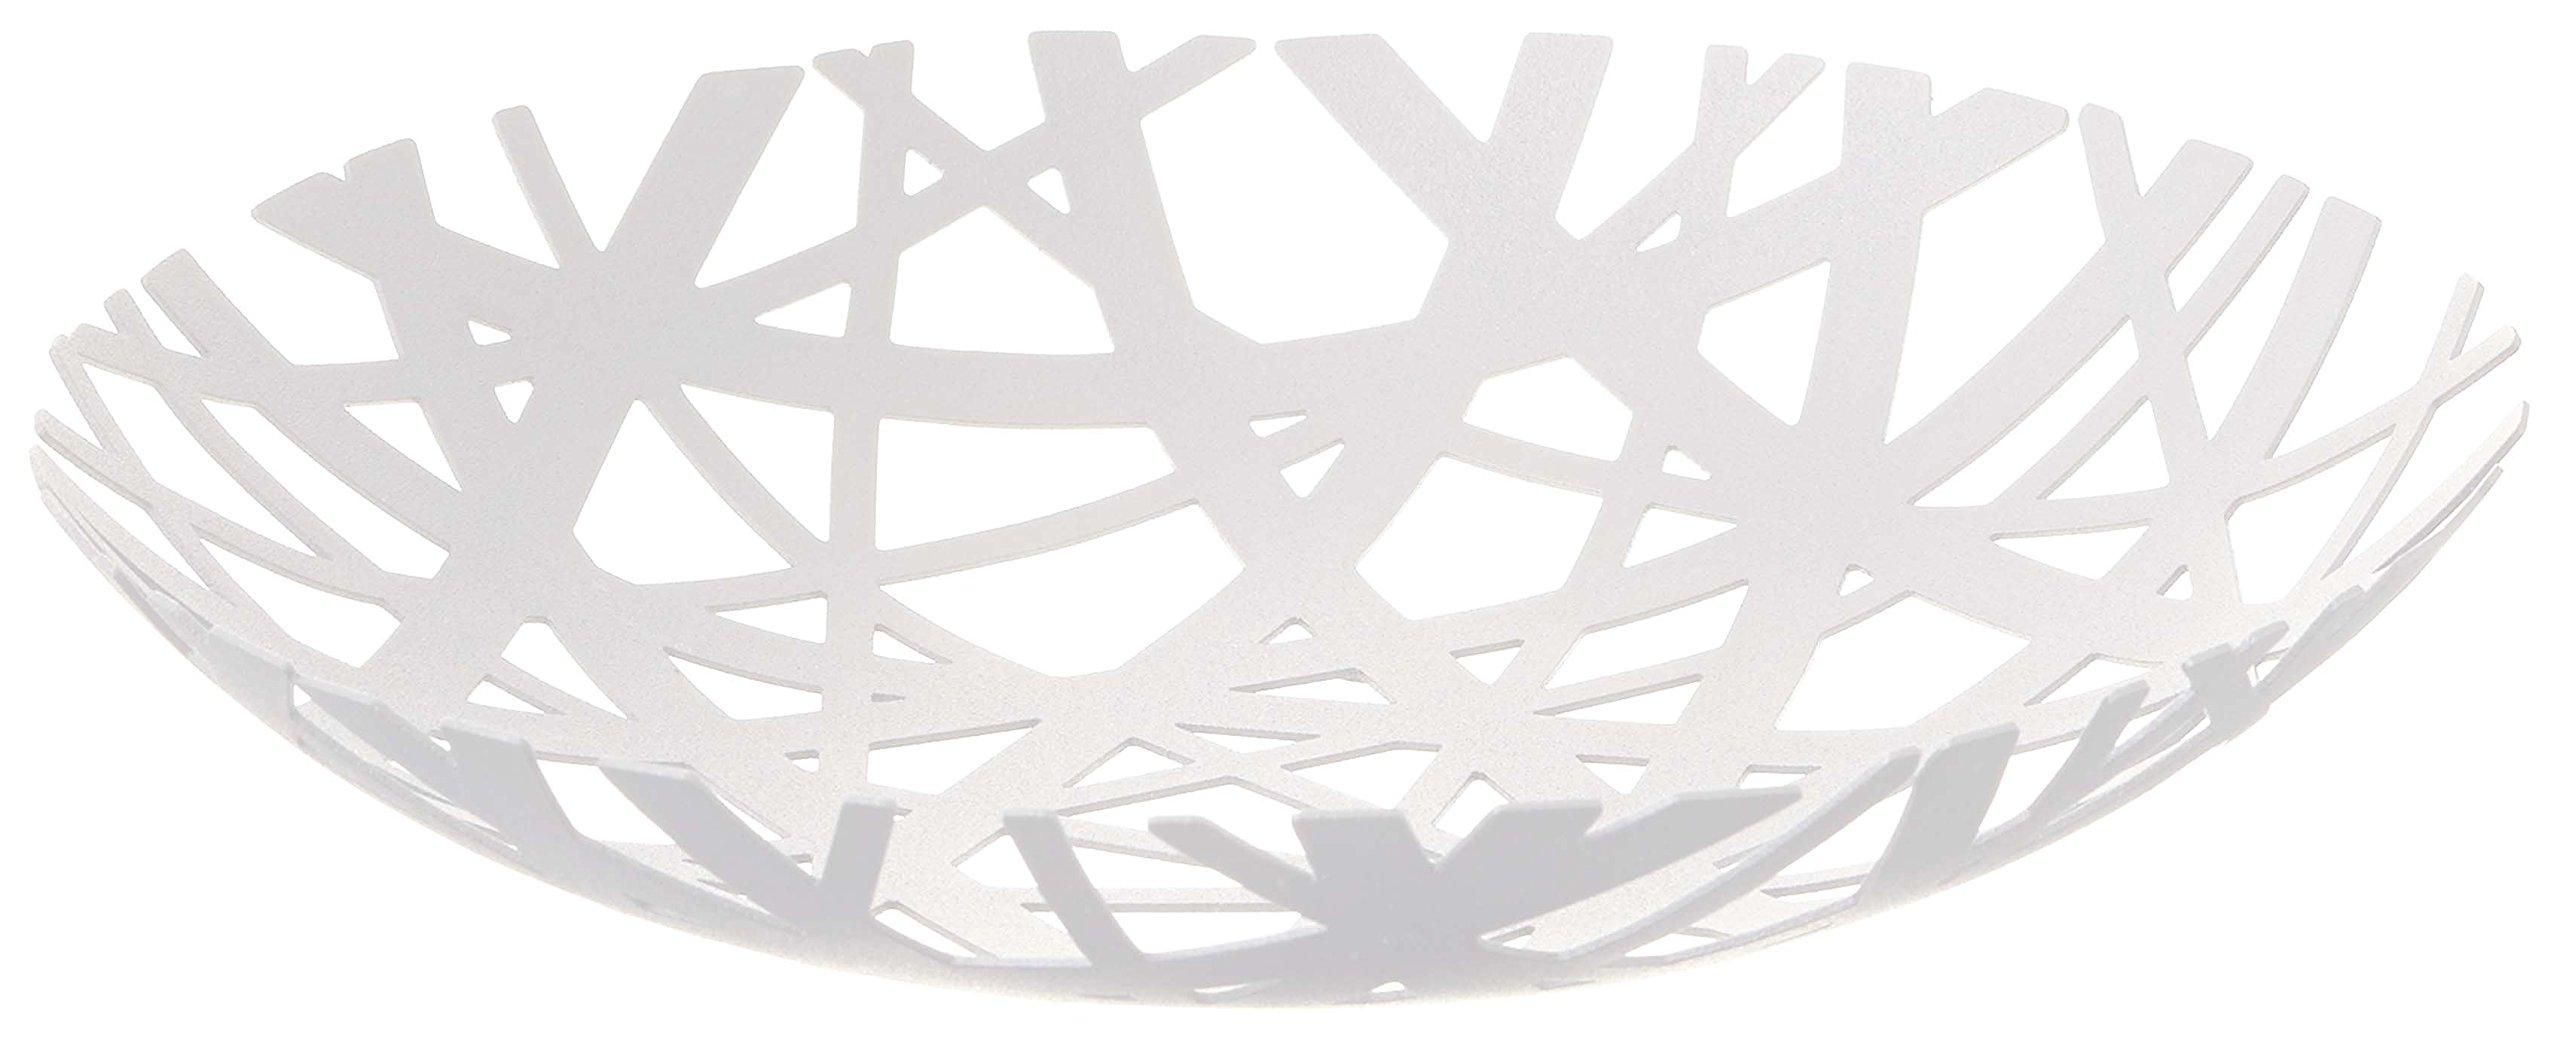 Decorative Centerpiece Bowl in White - Powder-Coated Steel